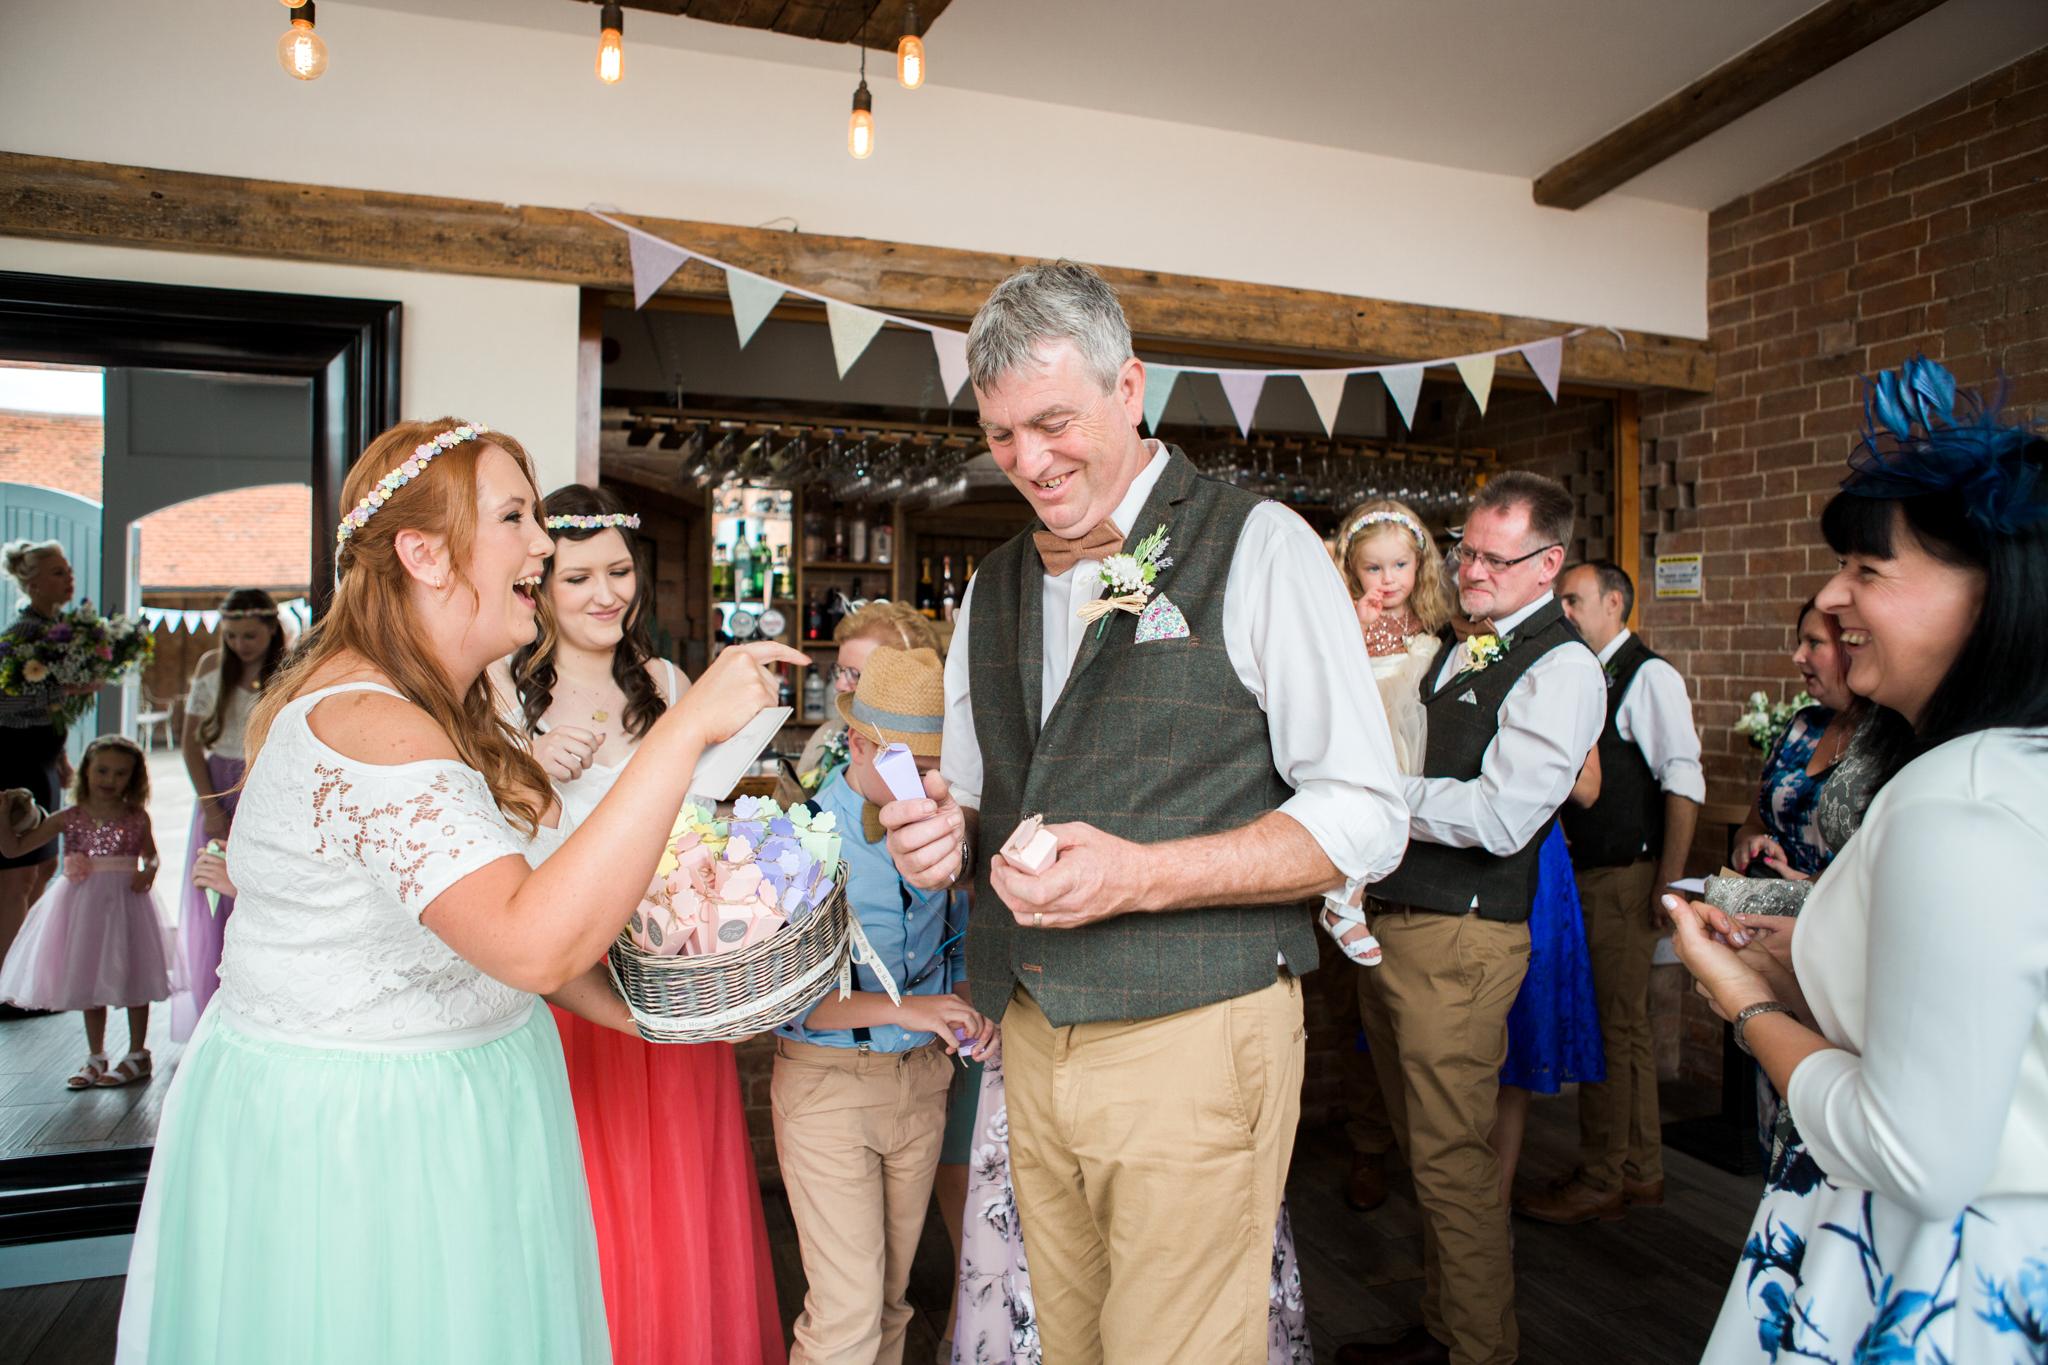 Rowsie & Lee, Swallows Nest Barn Wedding, Cotswold wedding photographer, Warwickshire Wedding Photographer-58.jpg